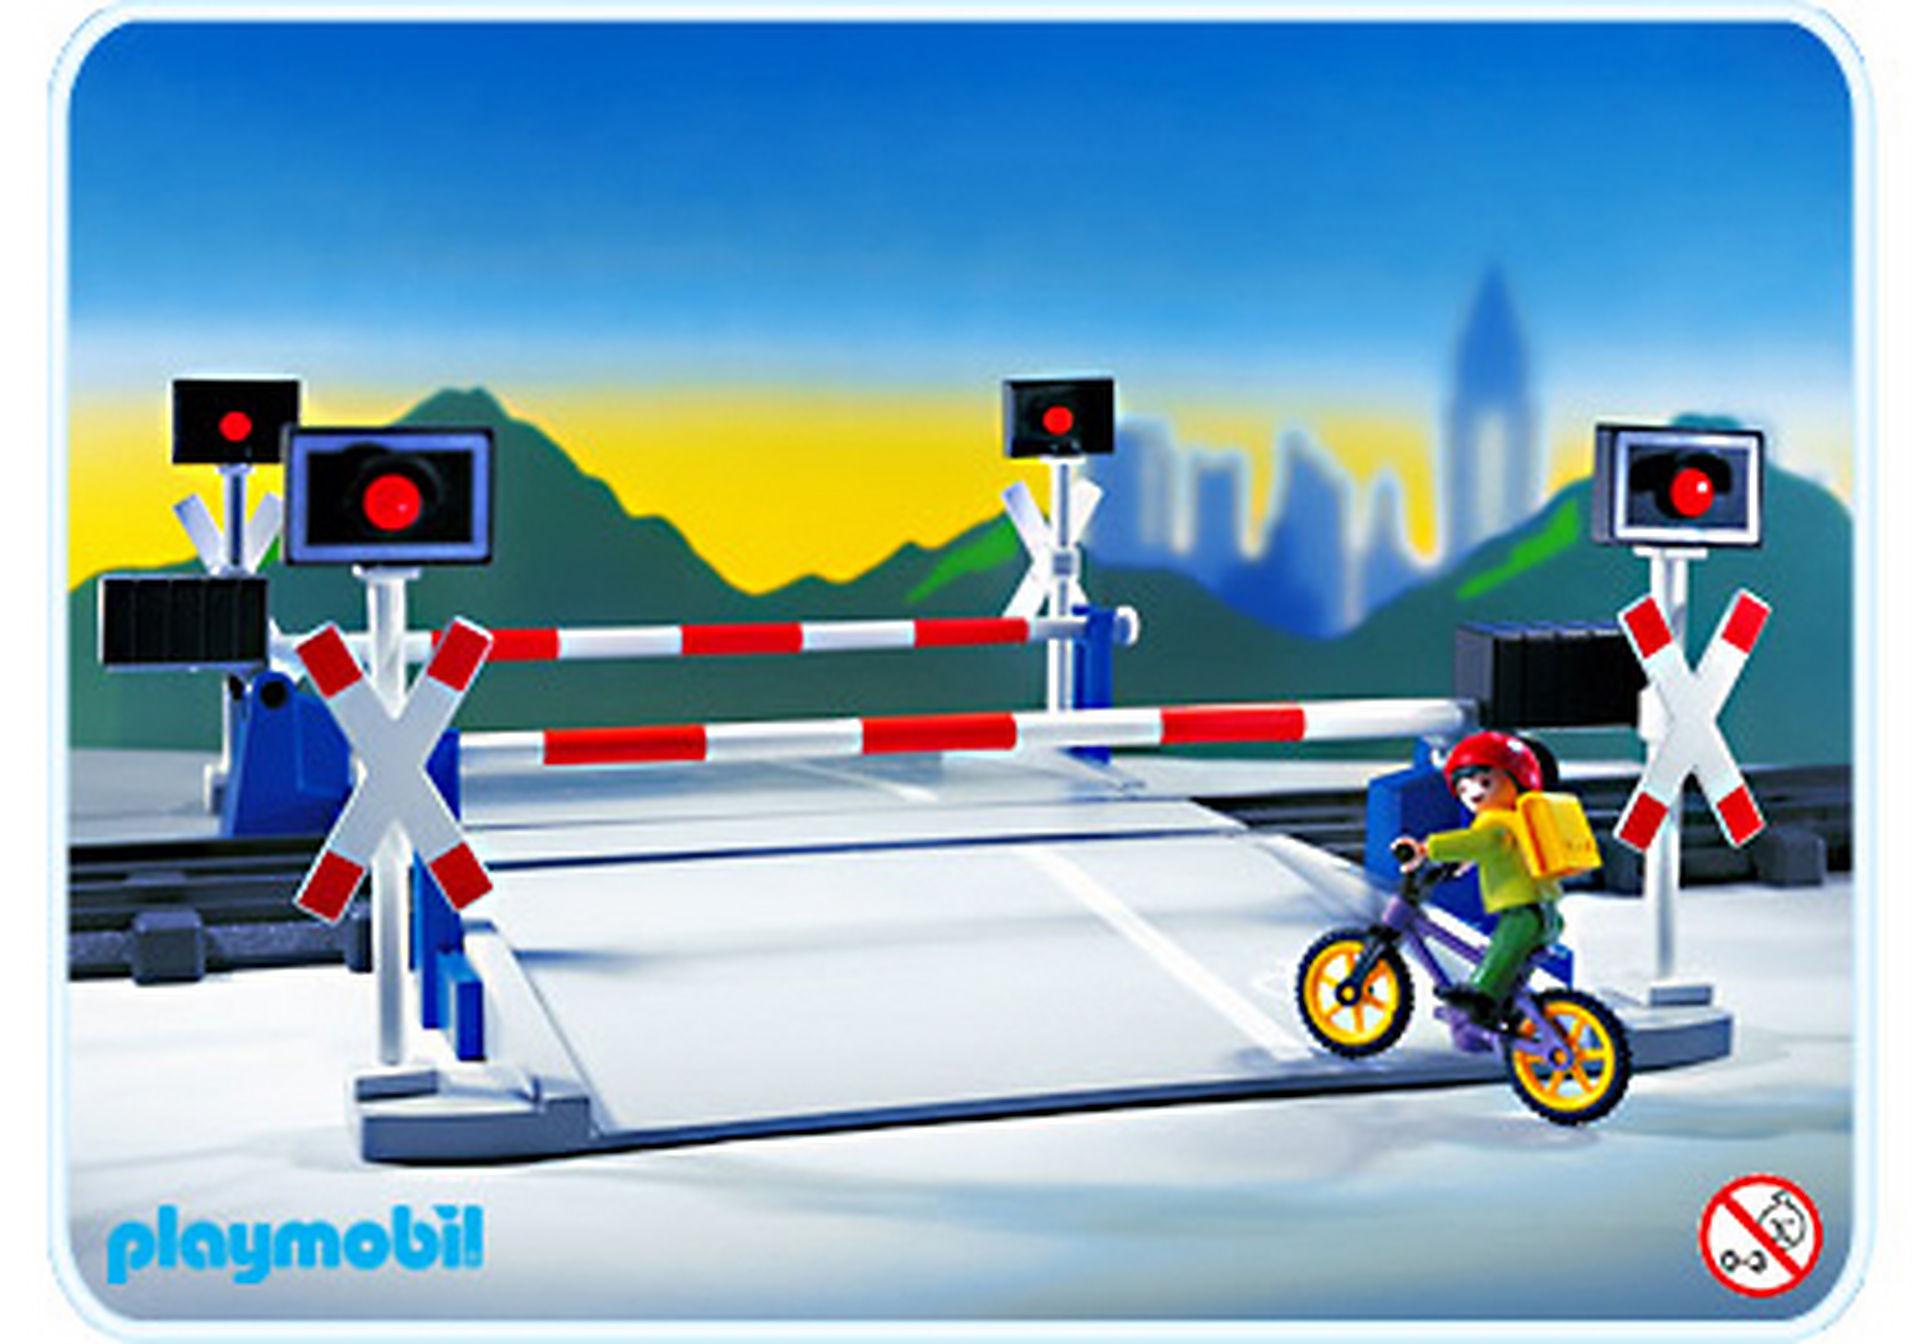 http://media.playmobil.com/i/playmobil/4383-A_product_detail/Beschrankter Bahnübergang